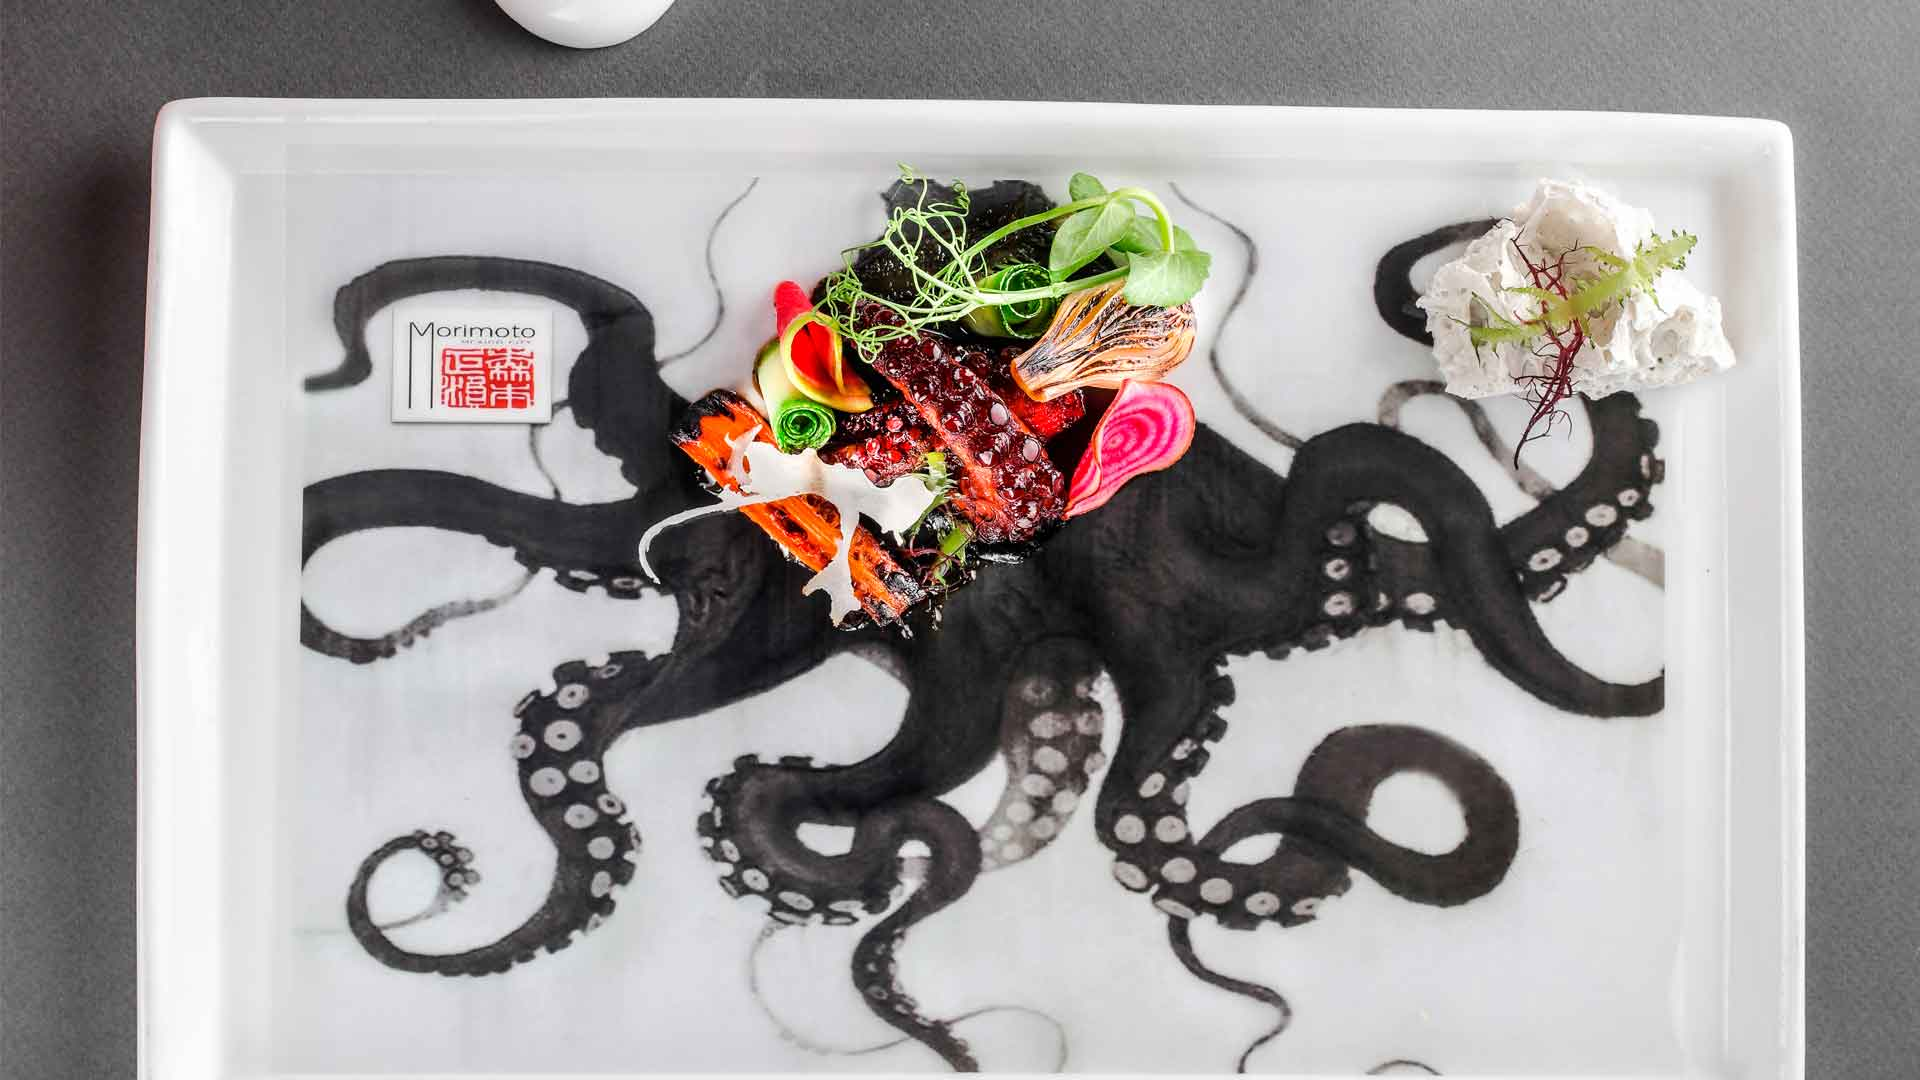 Morimoto, Beefbar y China Grill, de inspiración peninsular